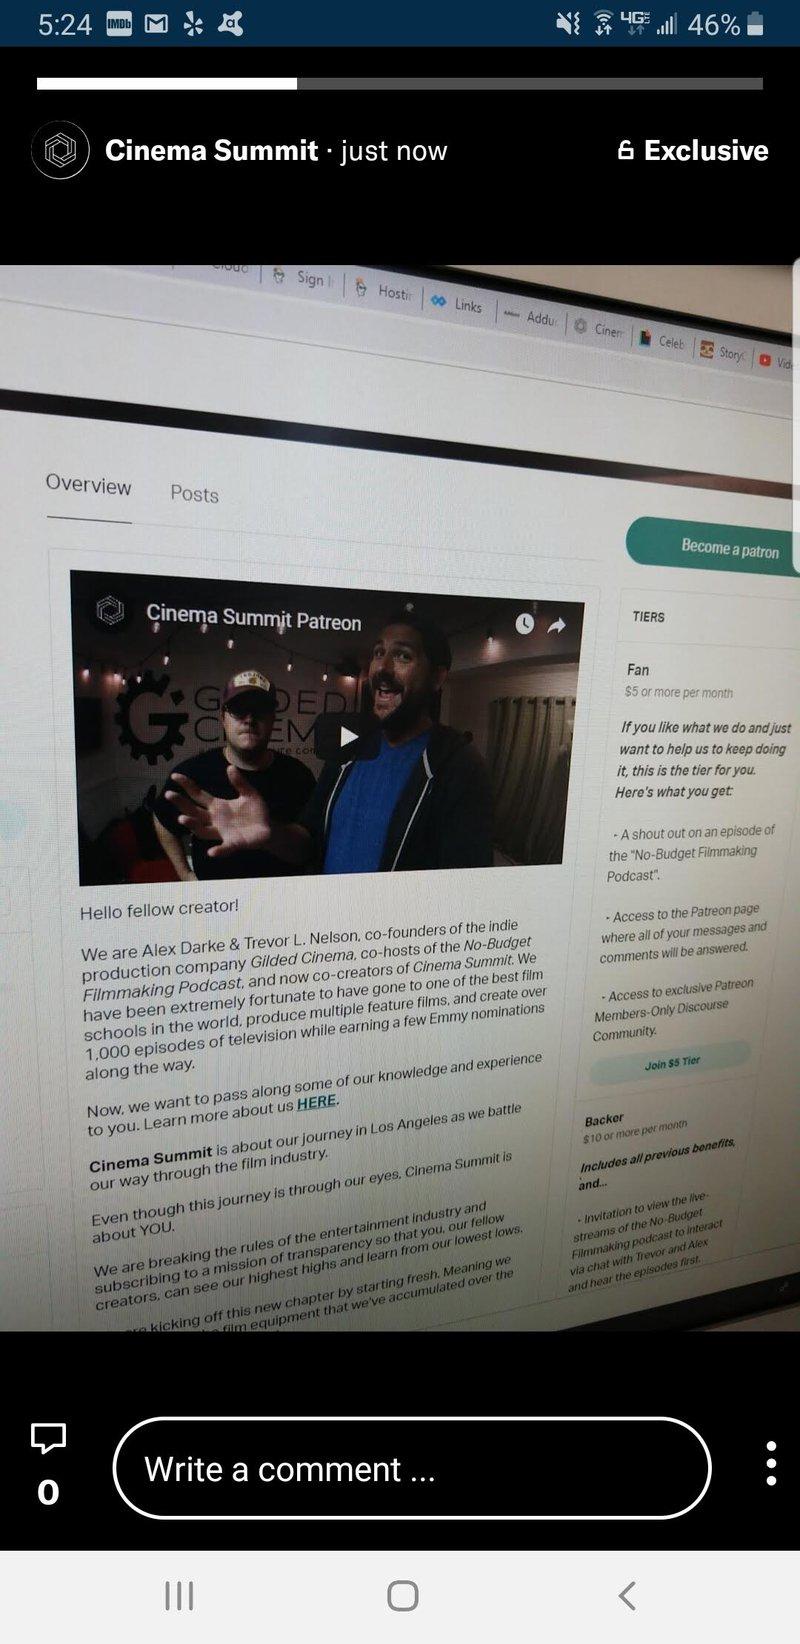 Cinema Summit Social Media Patreon Lens